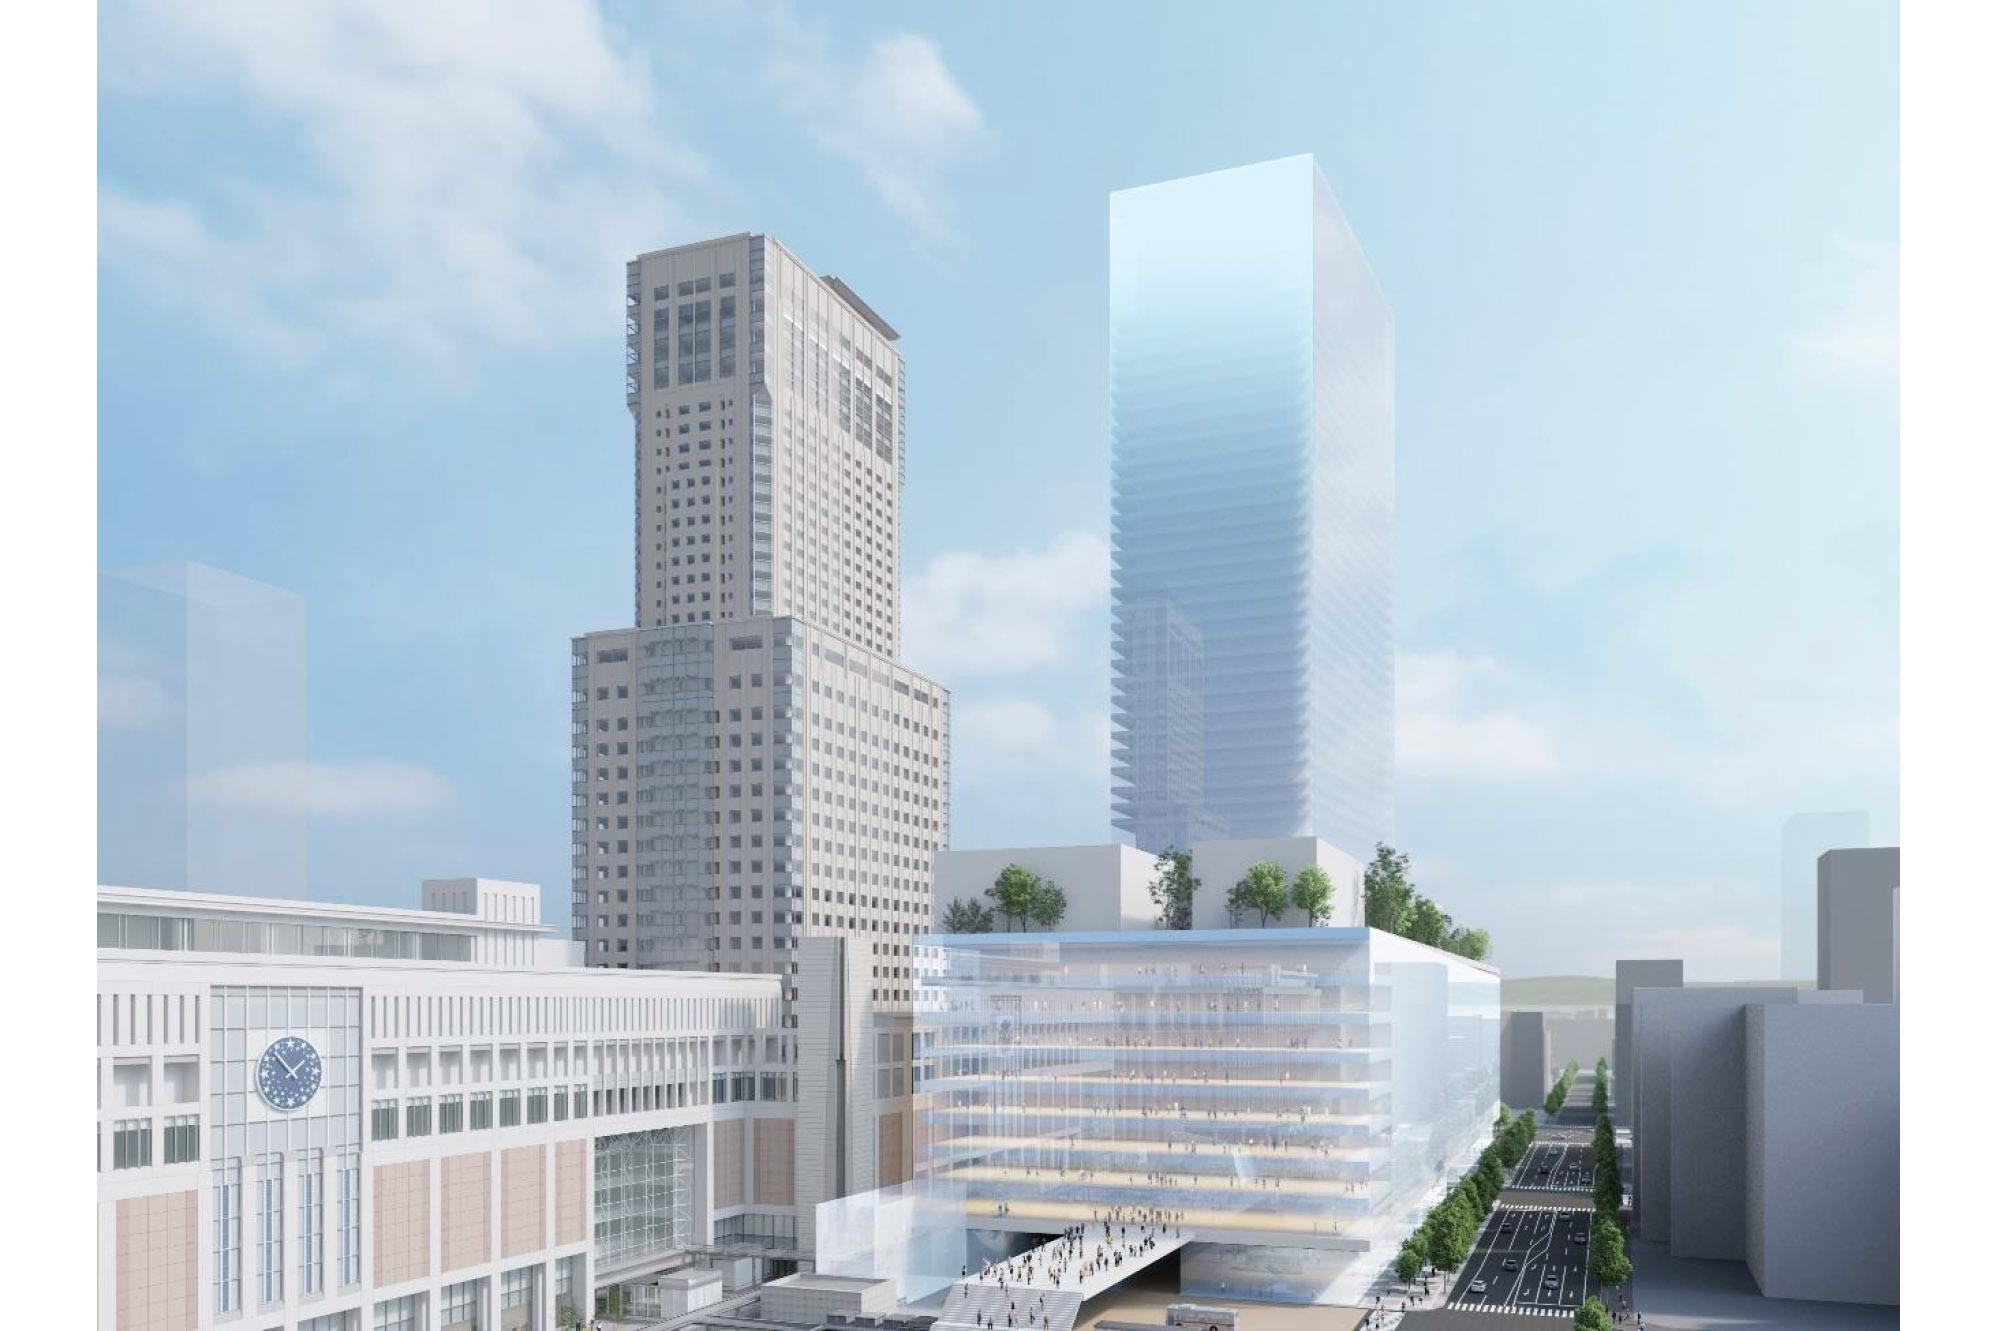 JR北海道は2022年度から北海道新幹線札幌延伸に向けた新幹線高架橋工事に着手。併せて、隣接する再開発ビルのマスターアーキテクトに内藤廣氏を招聘したことを発表した